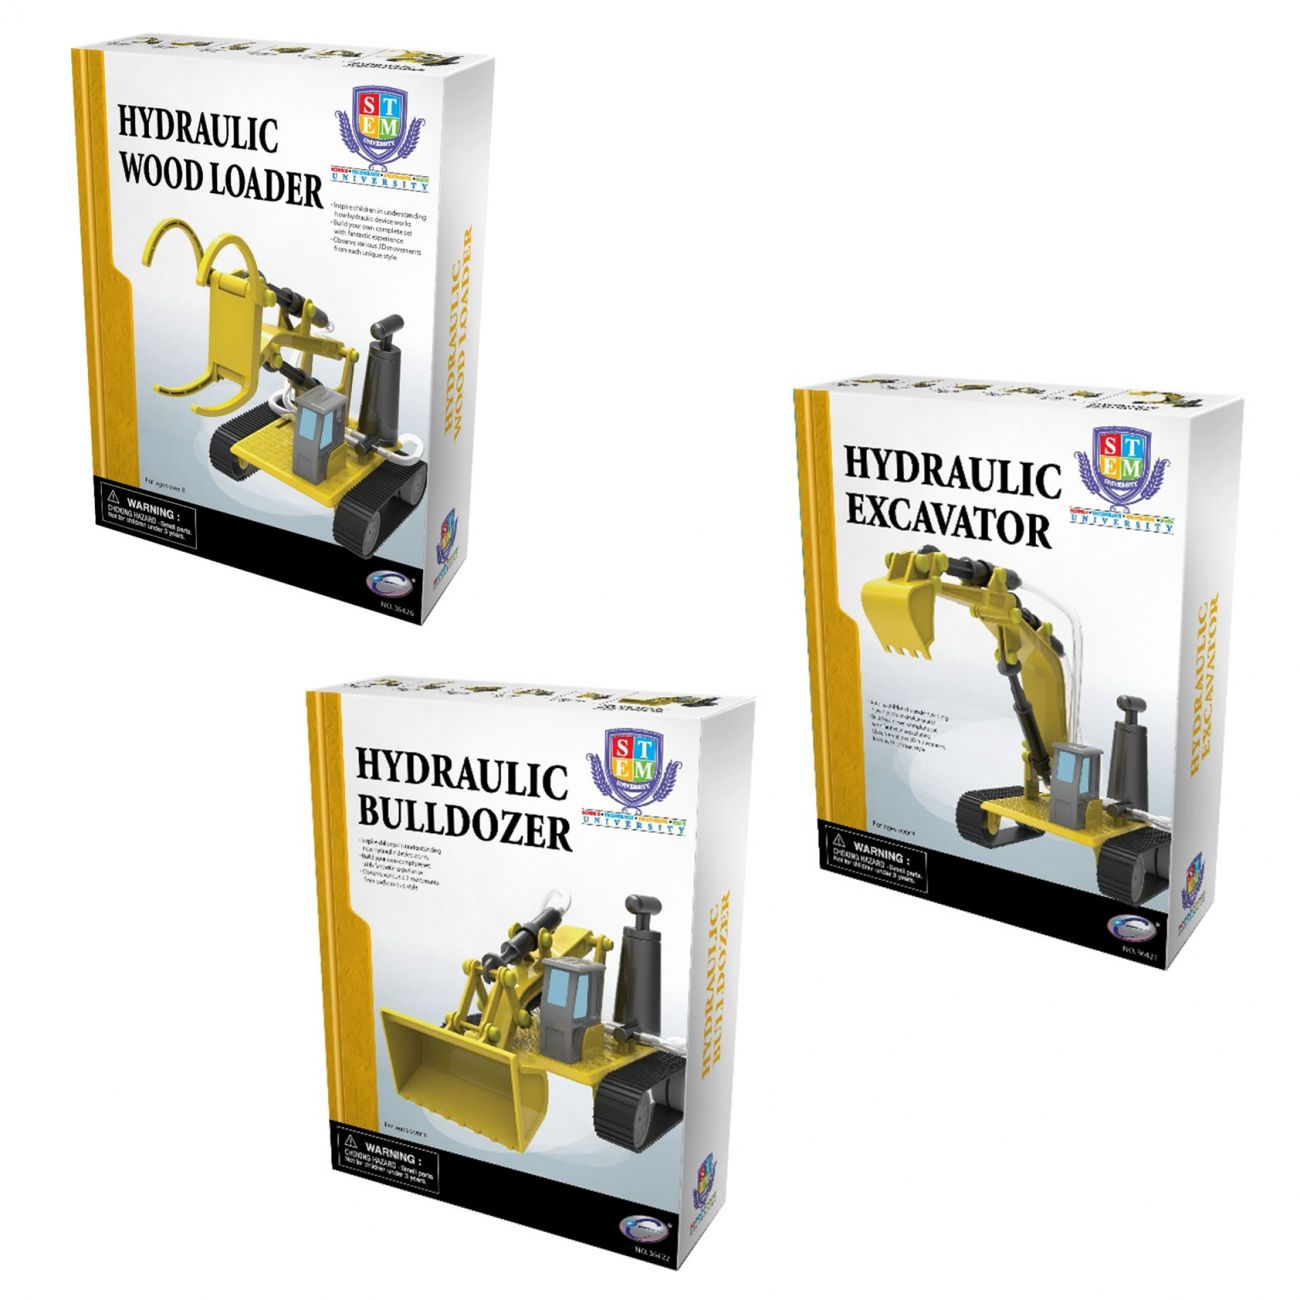 Hidravlični stroji, 3 vrste